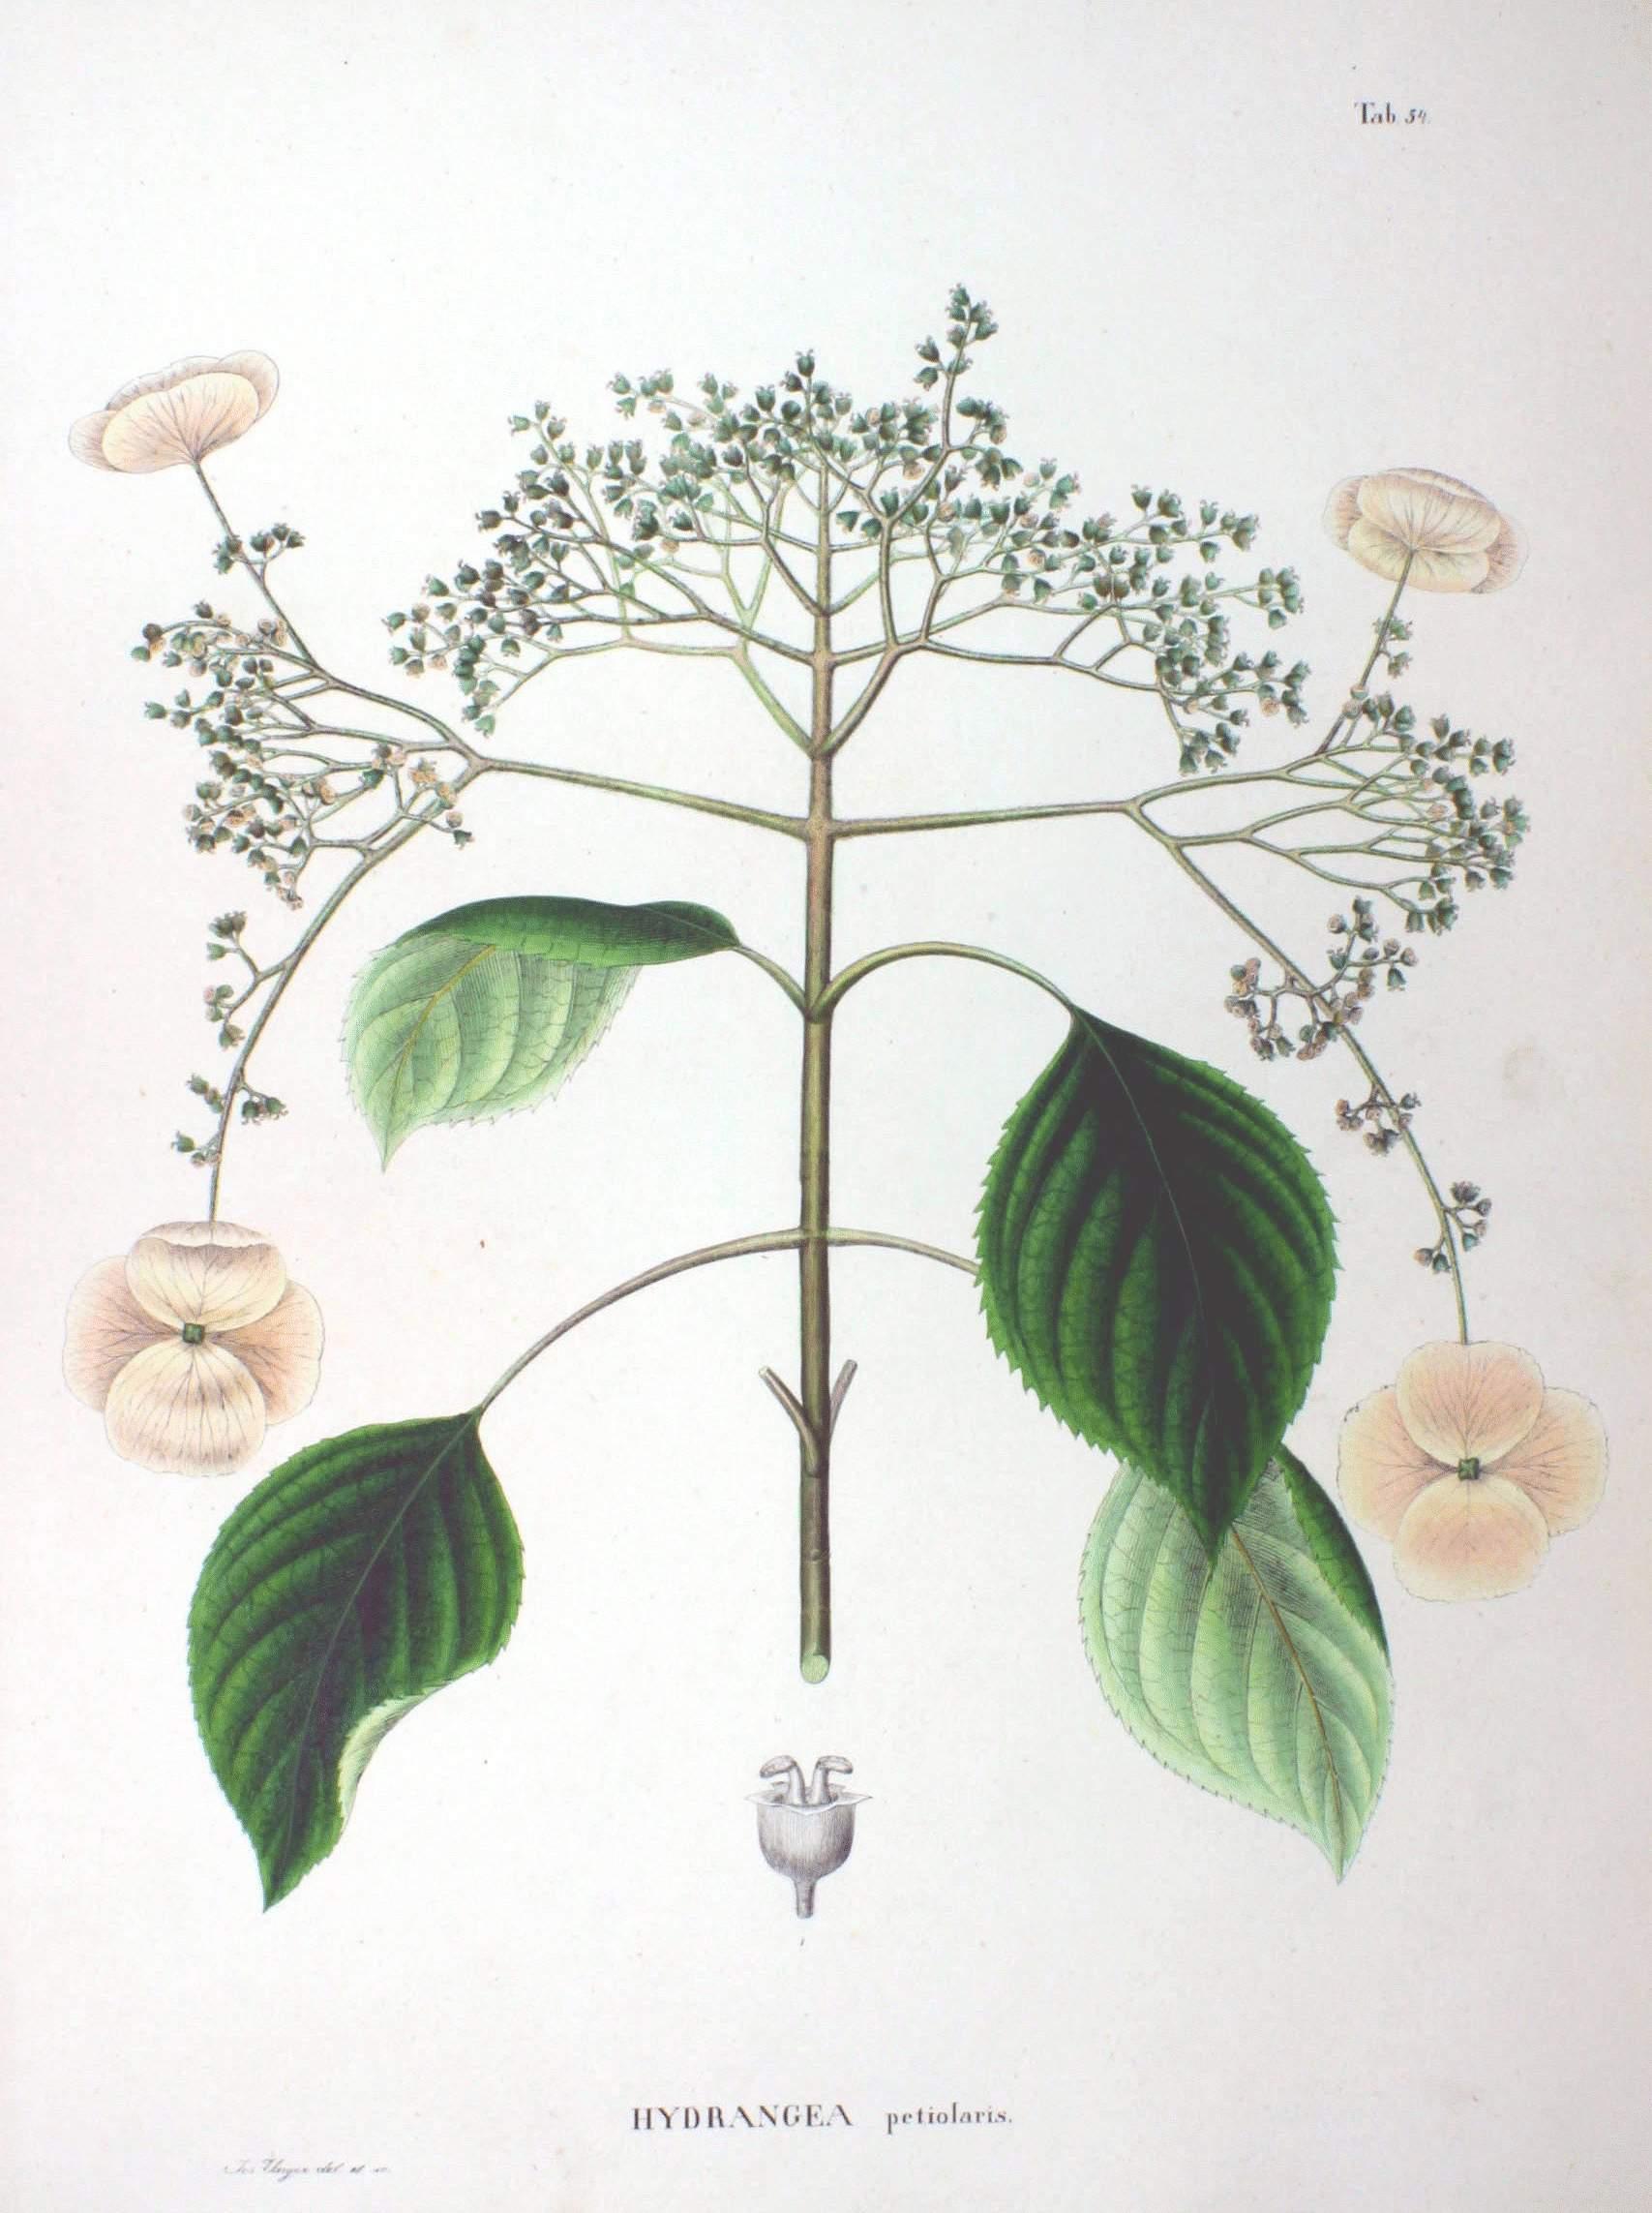 Hydrangea anomala ssp petiolaris SZ54